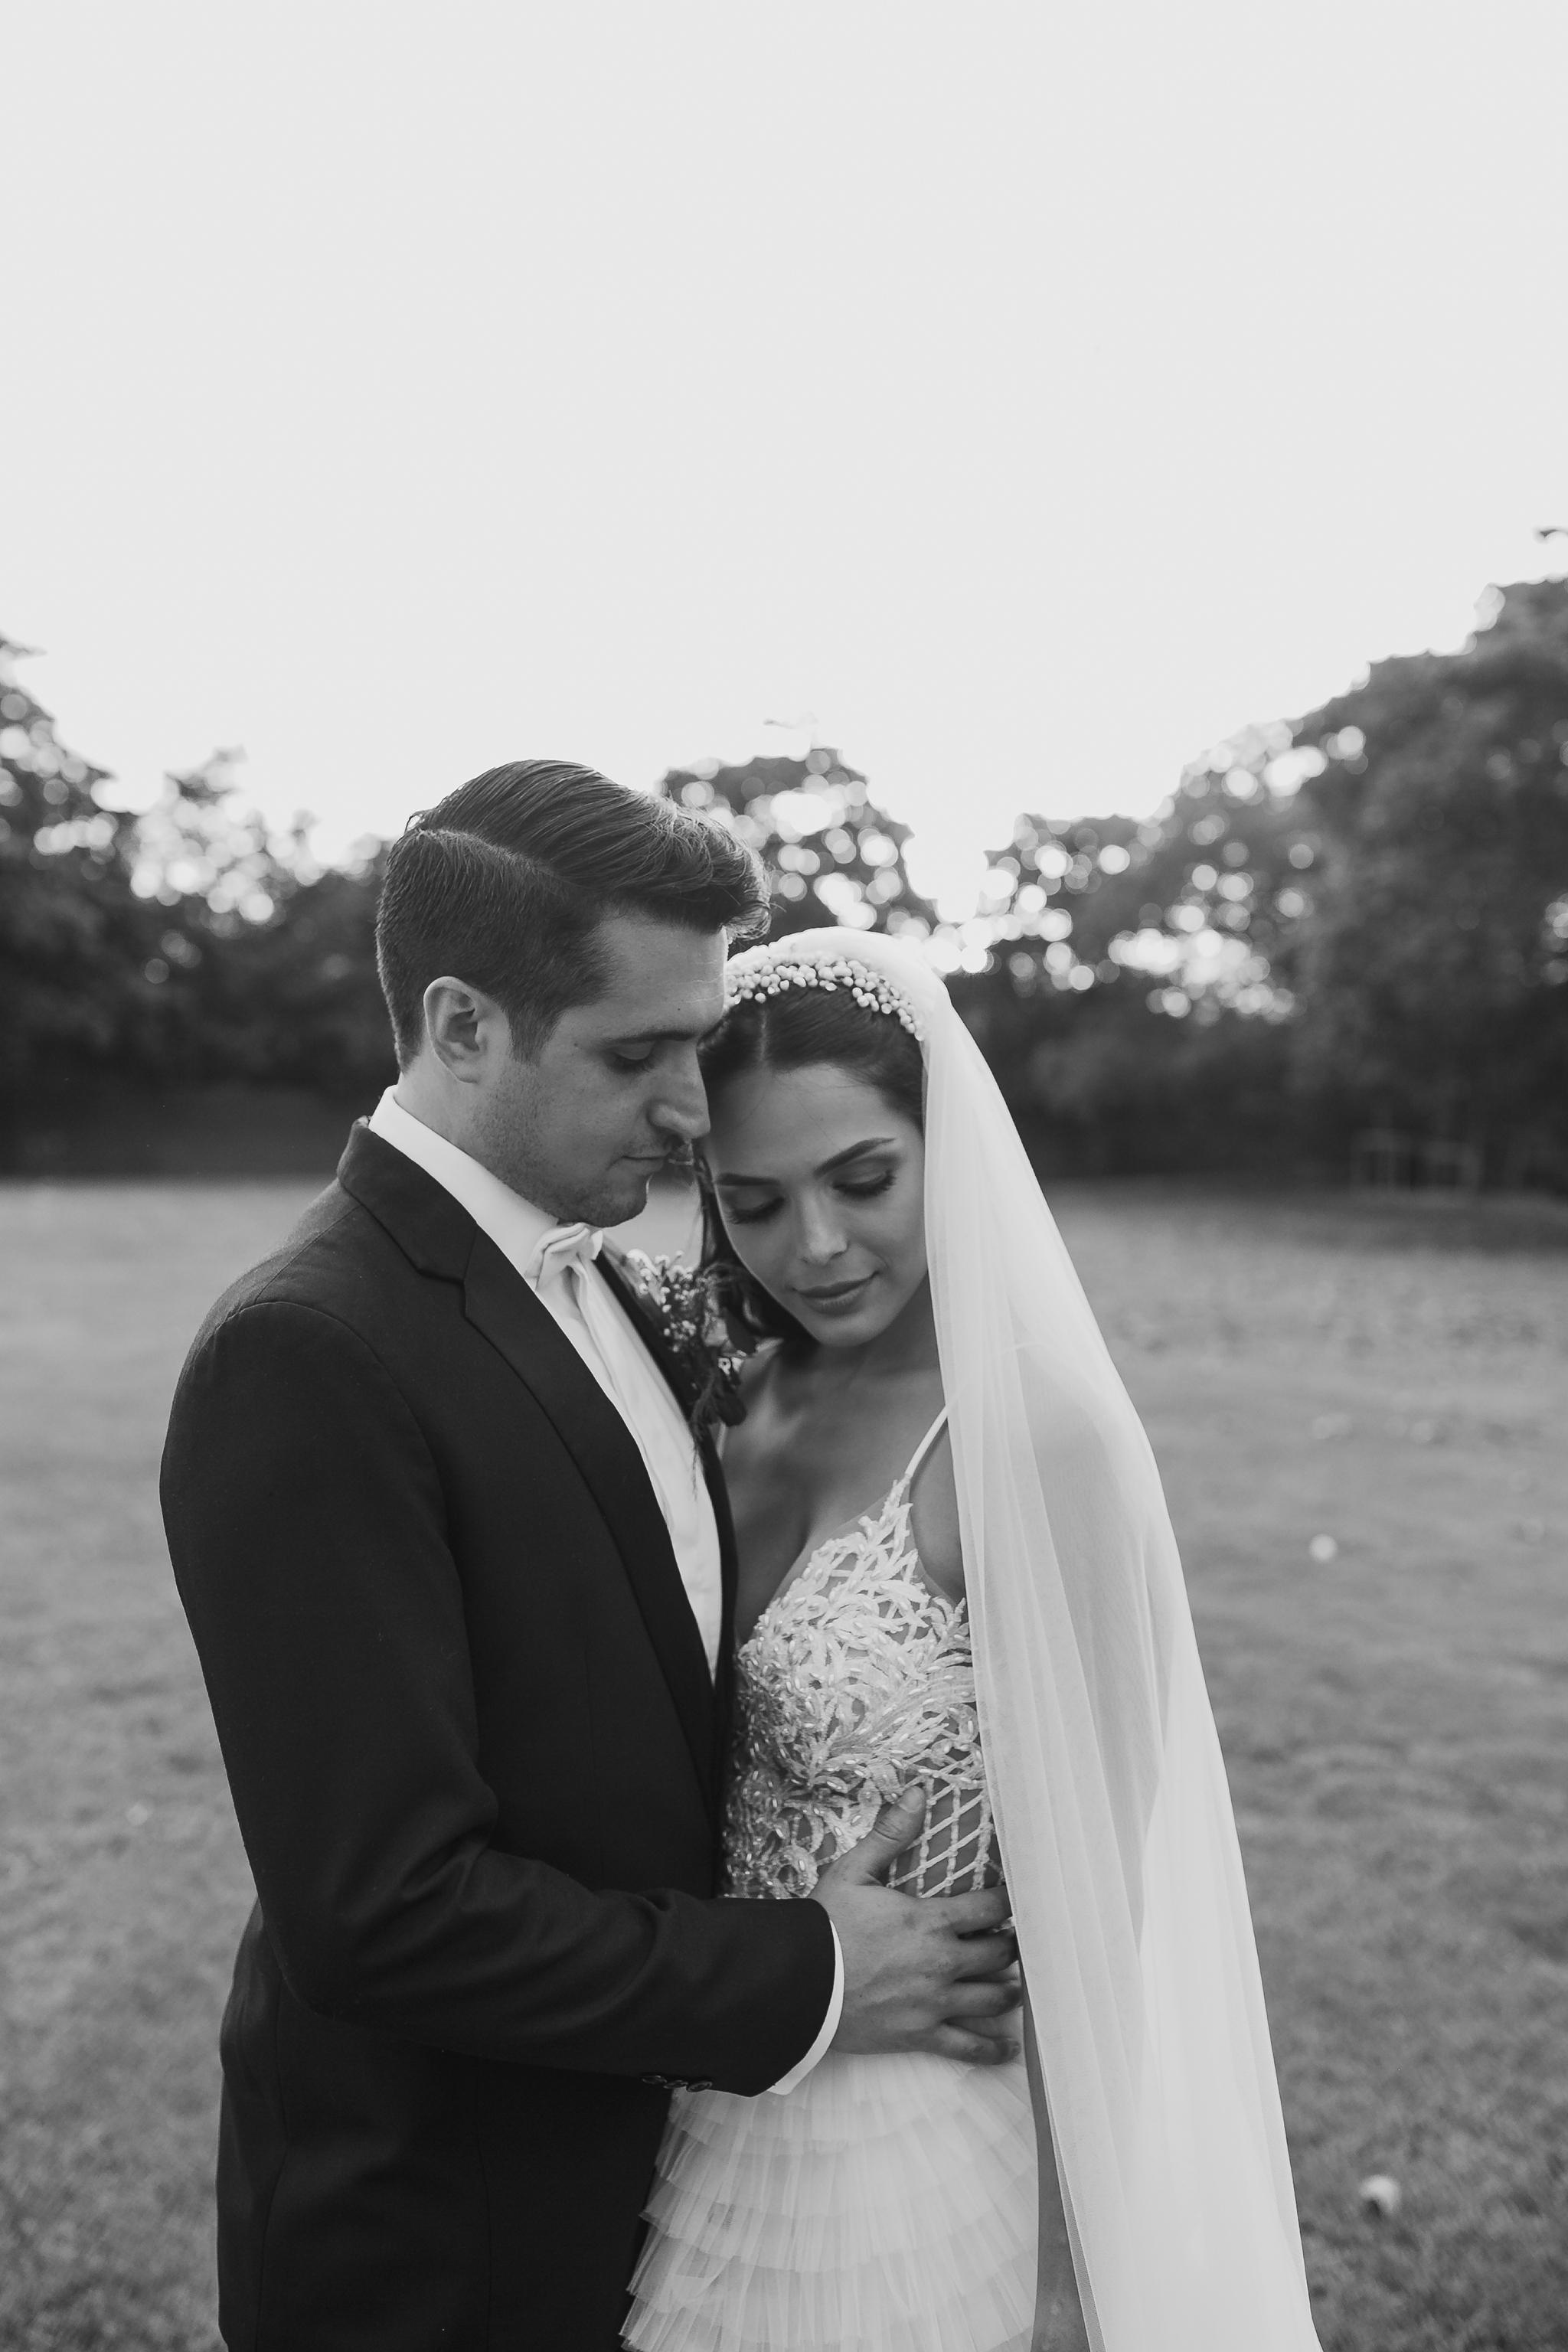 0824R&F__WeddingDestination_Weddingmerida_BodaMexico_FotografoDeBodas_FabrizioSimoneenFotografo.jpg